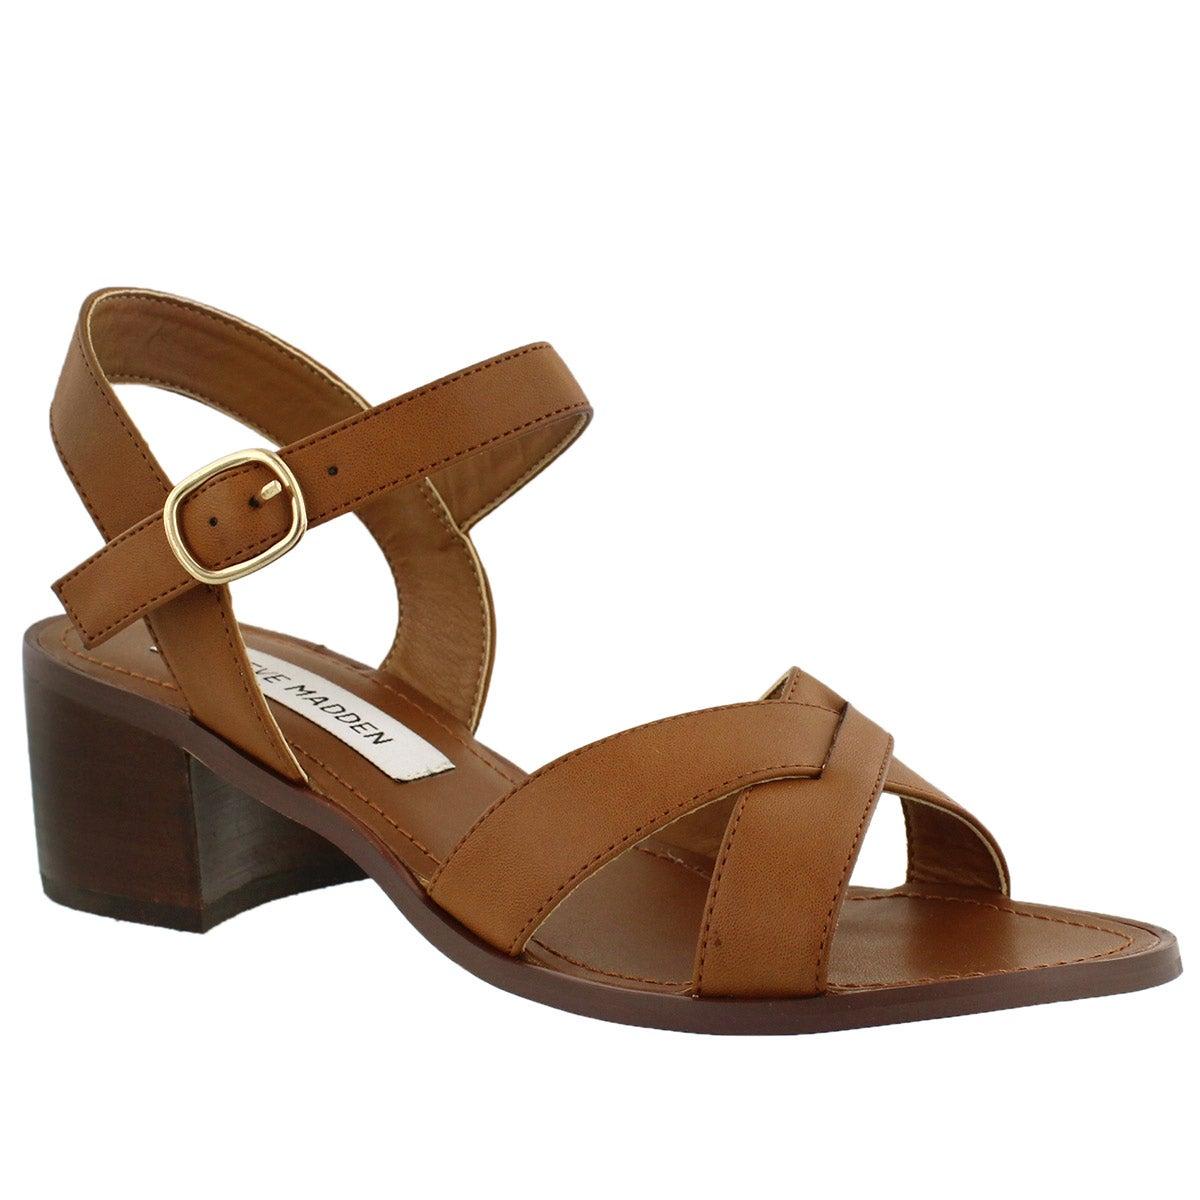 Women's FATIMA cognac dress sandals